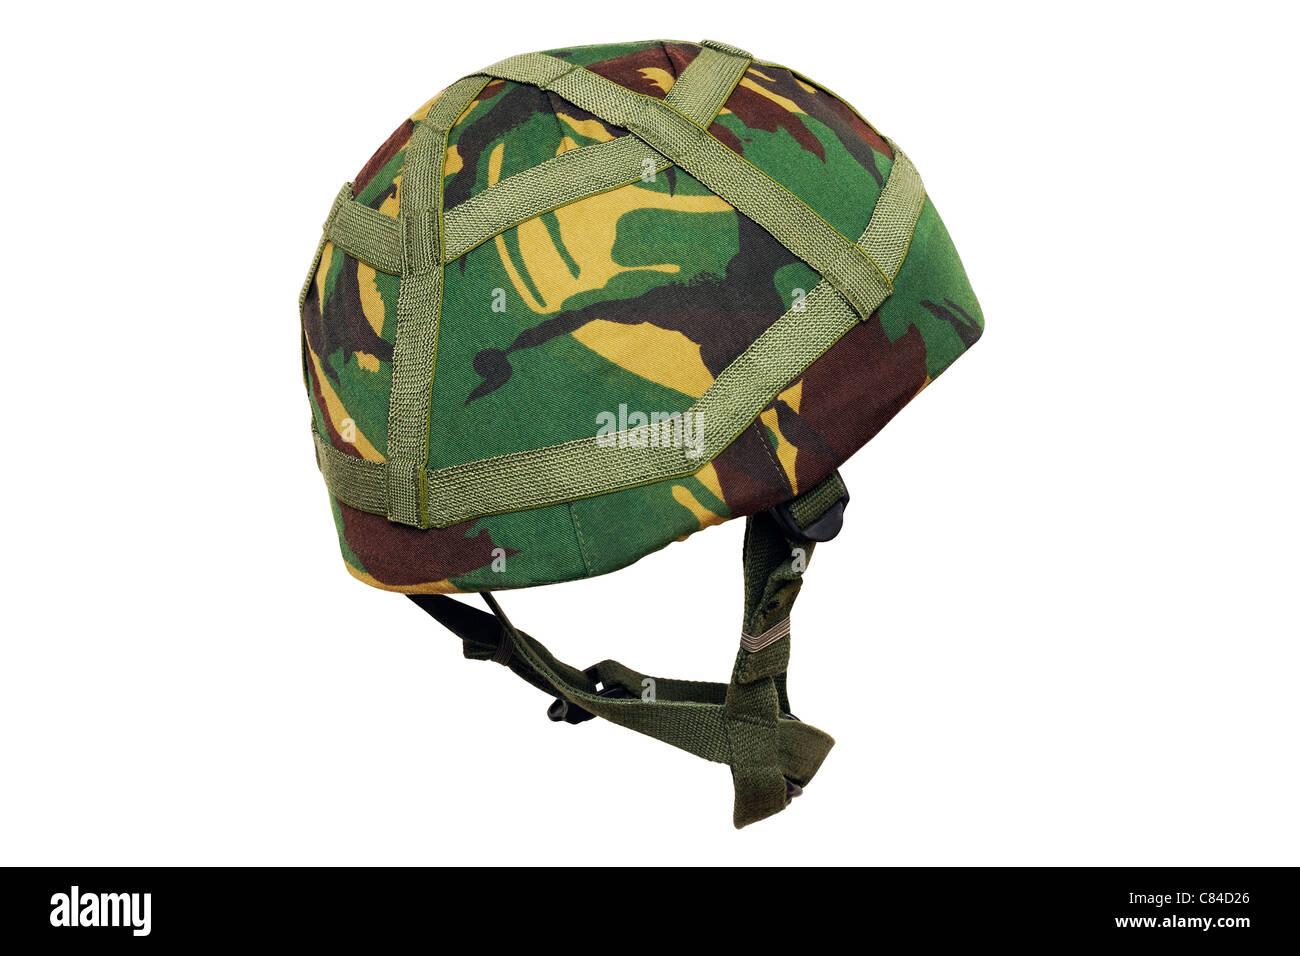 Army Helmet. British Army Issue MK.6 Kevlar Combat Helmet. - Stock Image